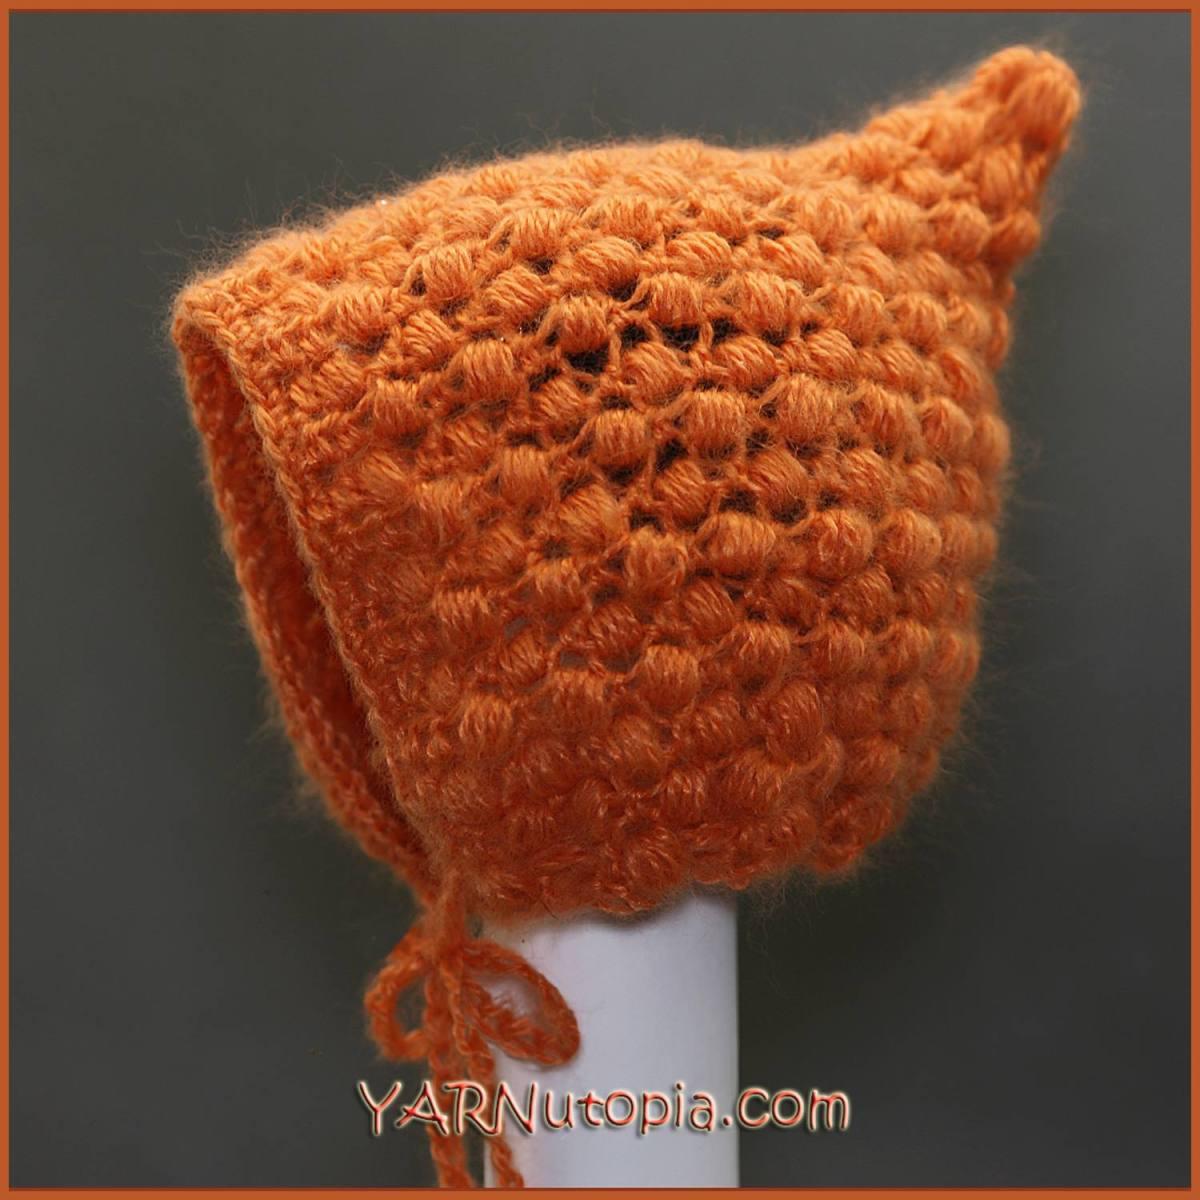 Crochet Tutorial: Pixie Puff Baby Bonnet « YARNutopia by Nadia Fuad